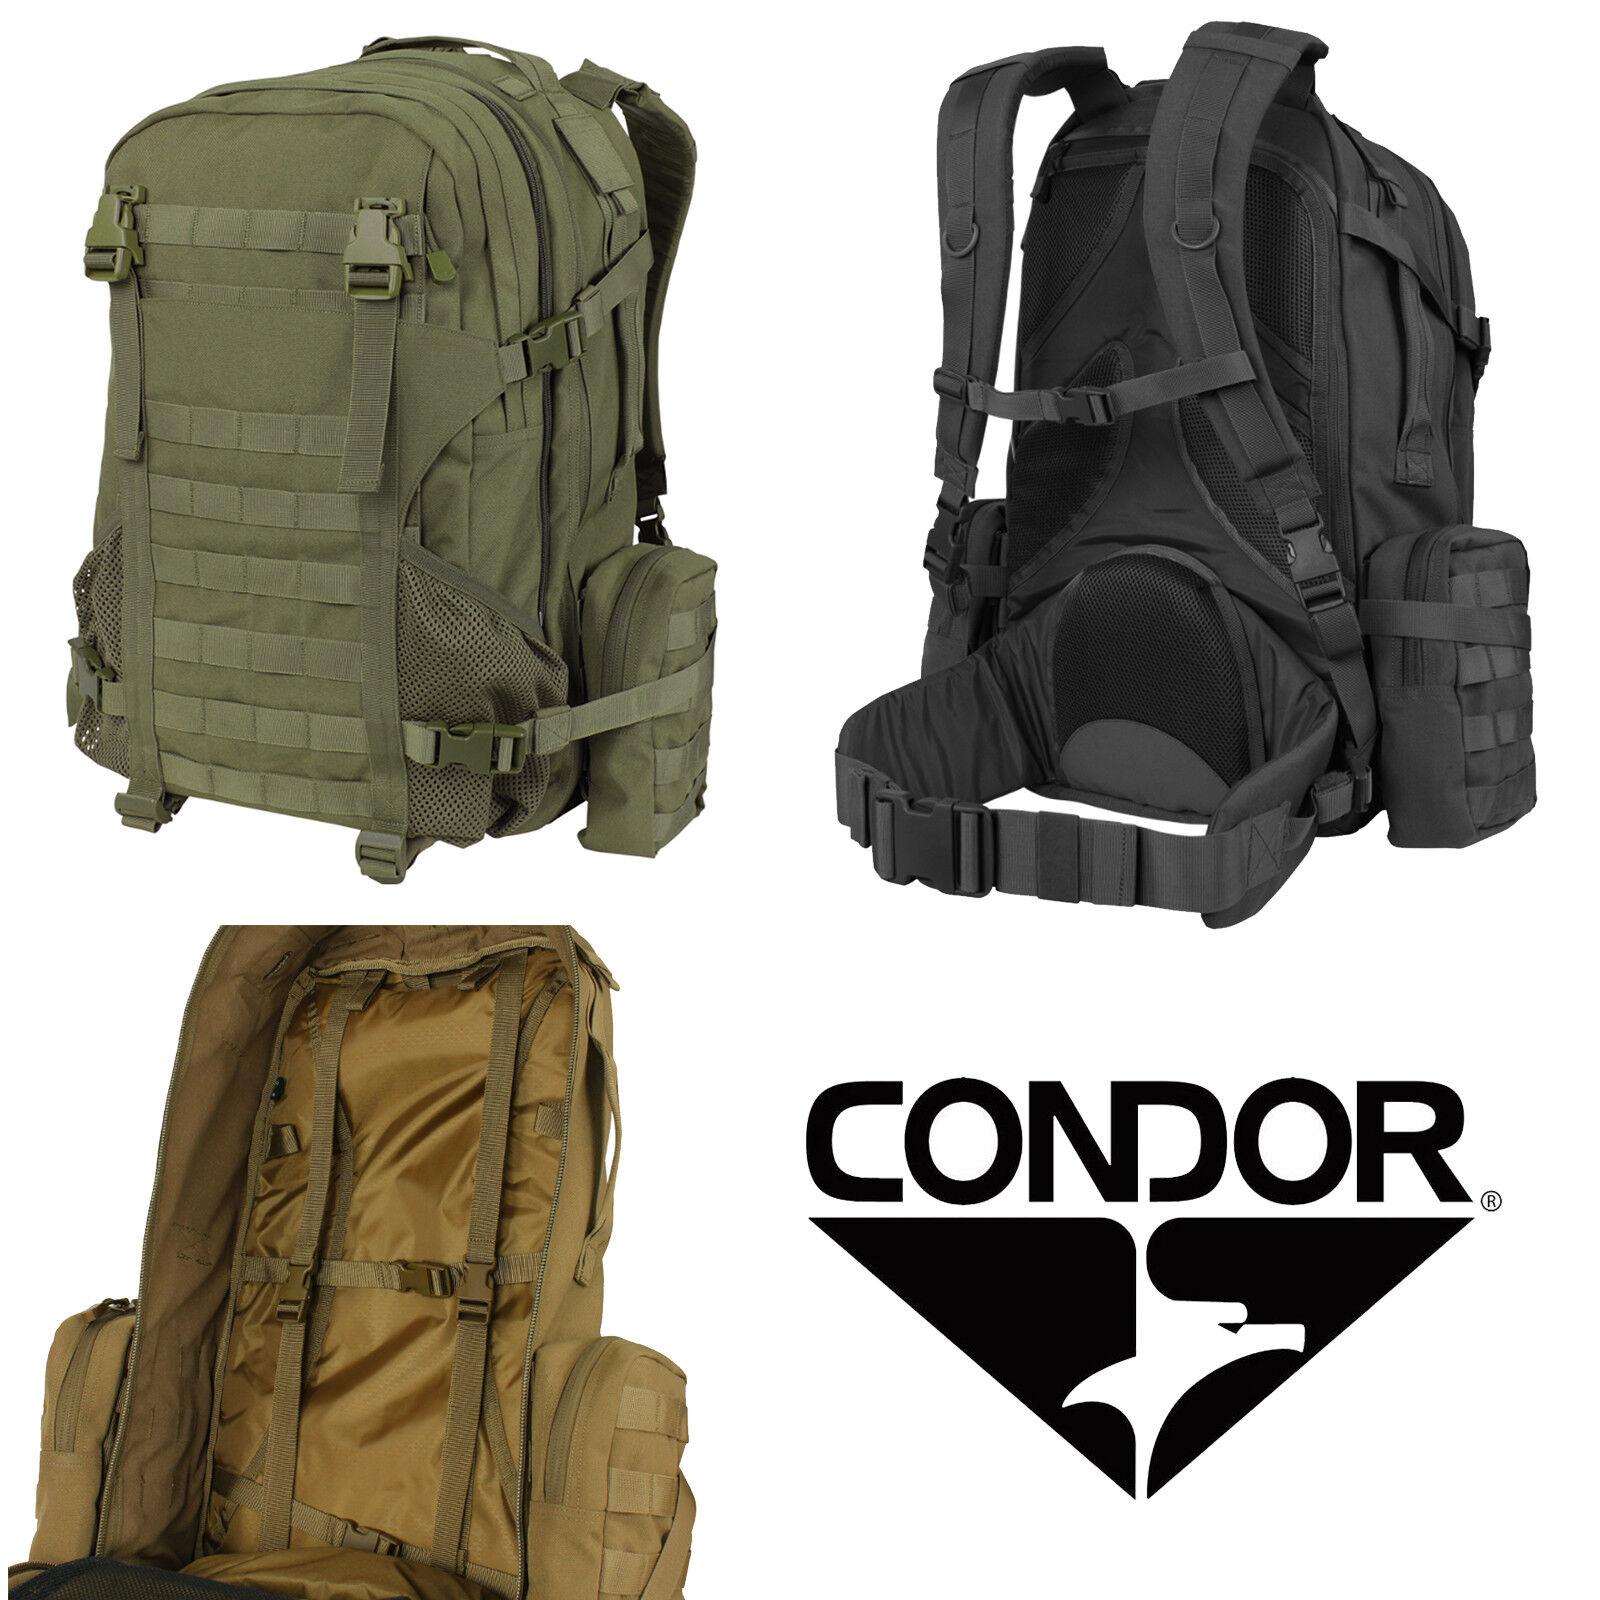 Condor Modular Molle Pals Wander Zelten Orion Assault Paket Rucksack 111054